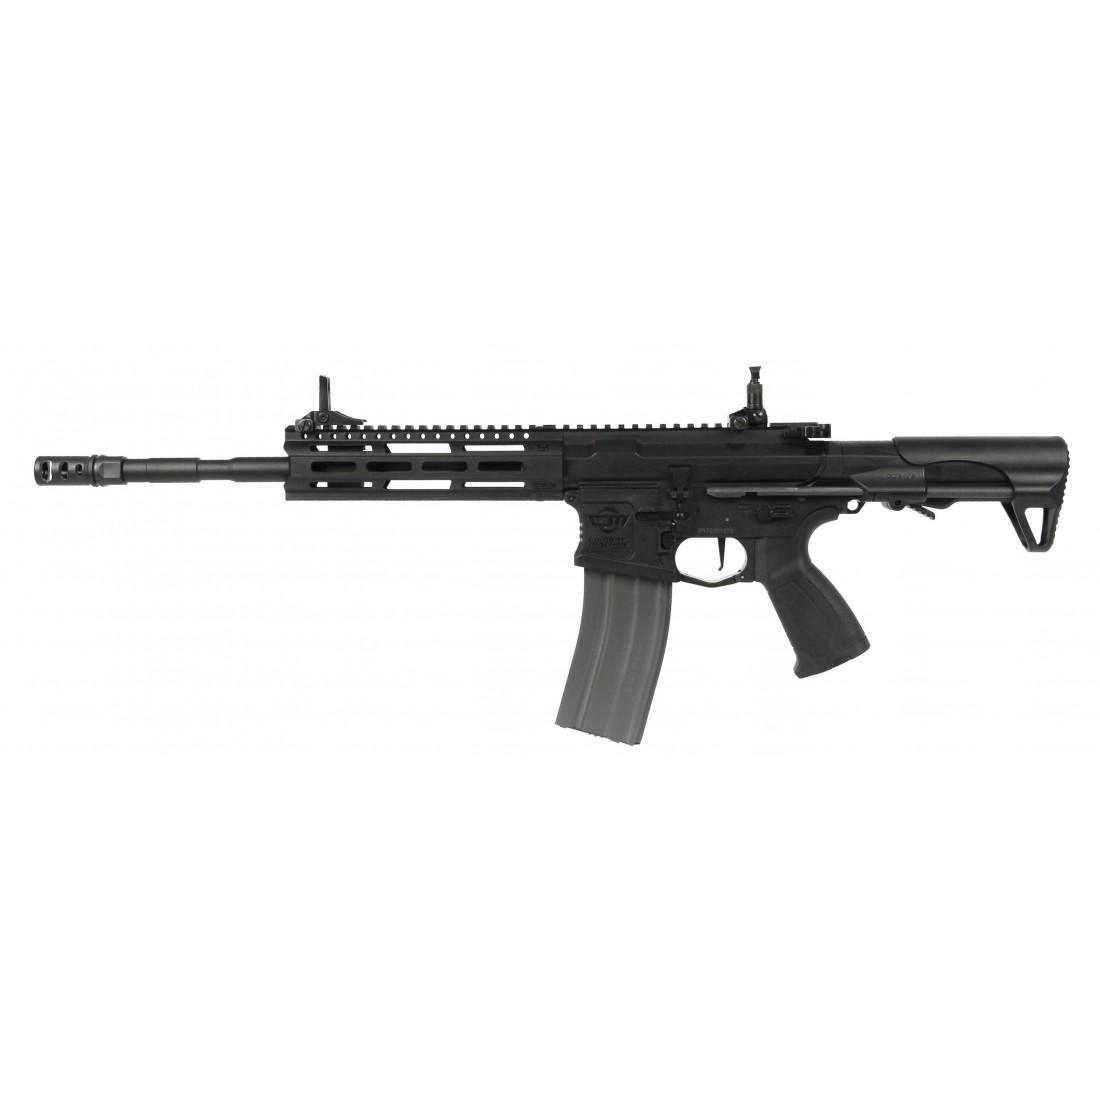 AEG CM16 Raider L 2.0E bk (EGC-16P-R2E-BNB-NCM) [G&G]